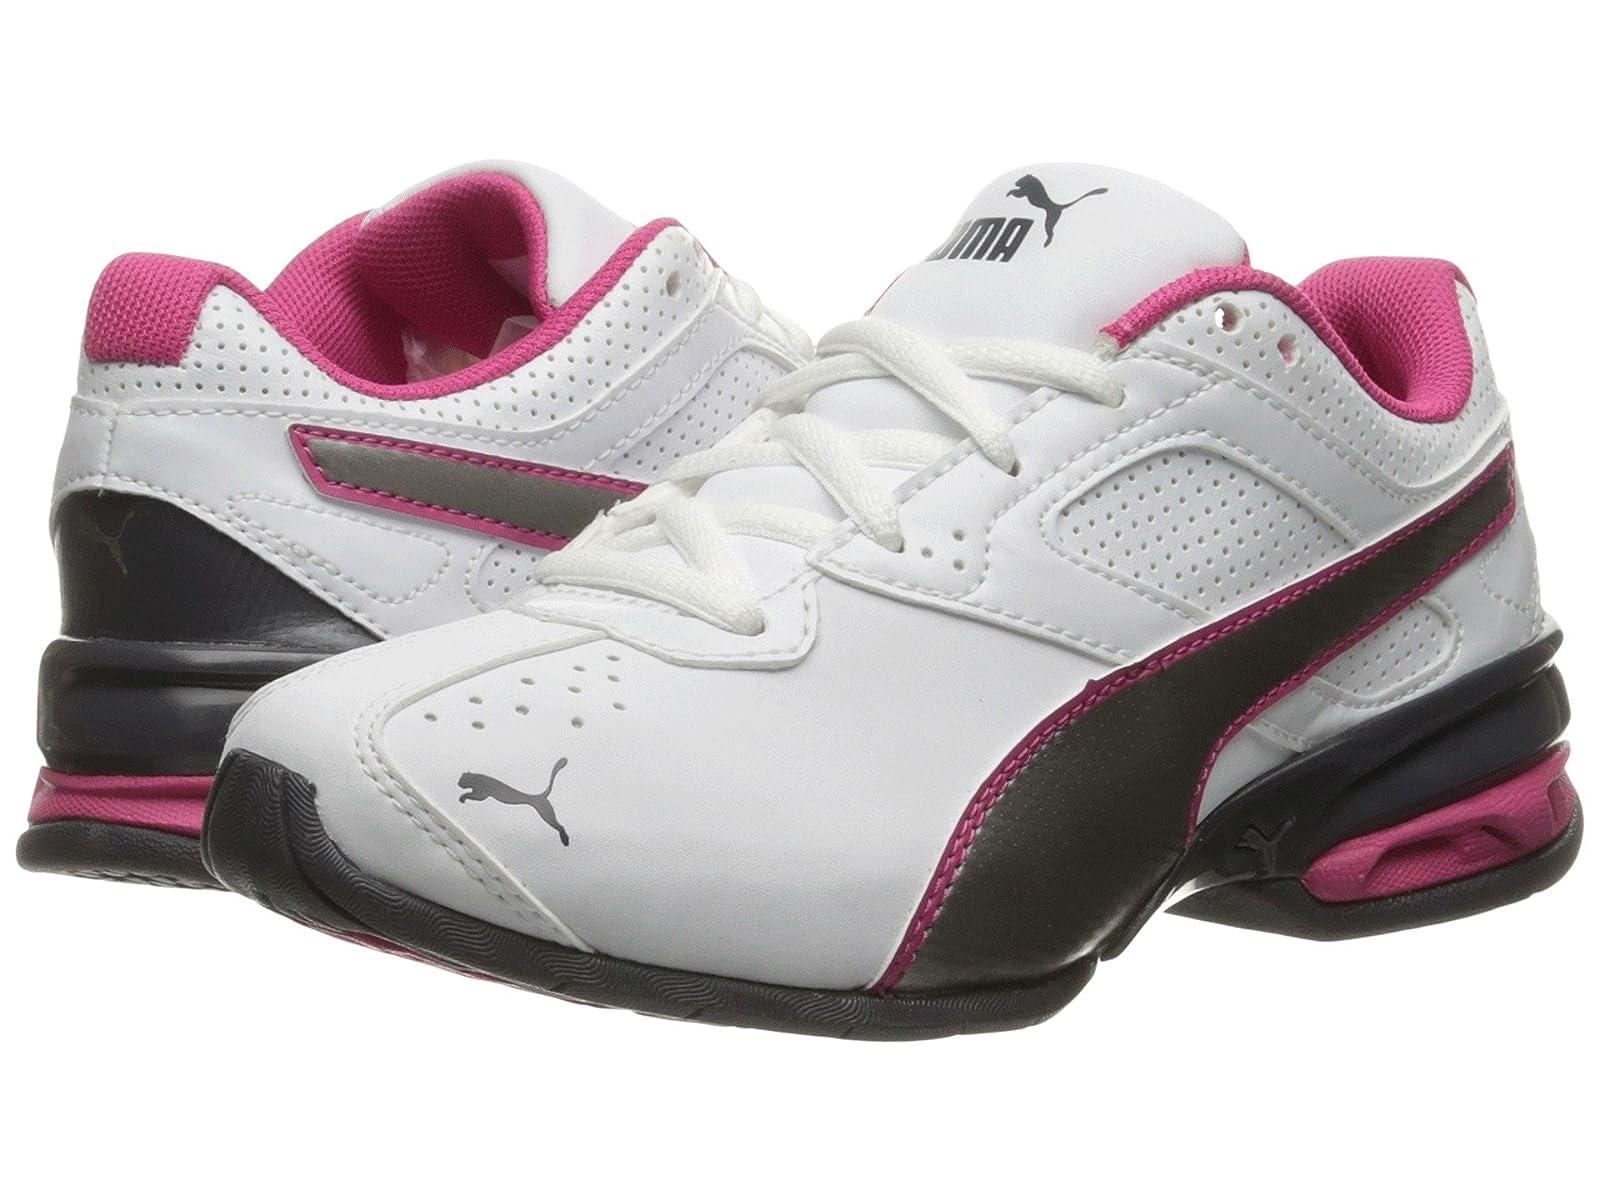 Puma Kids Tazon 6 SL PS (Little Kid/Big Kid)Cheap and distinctive eye-catching shoes